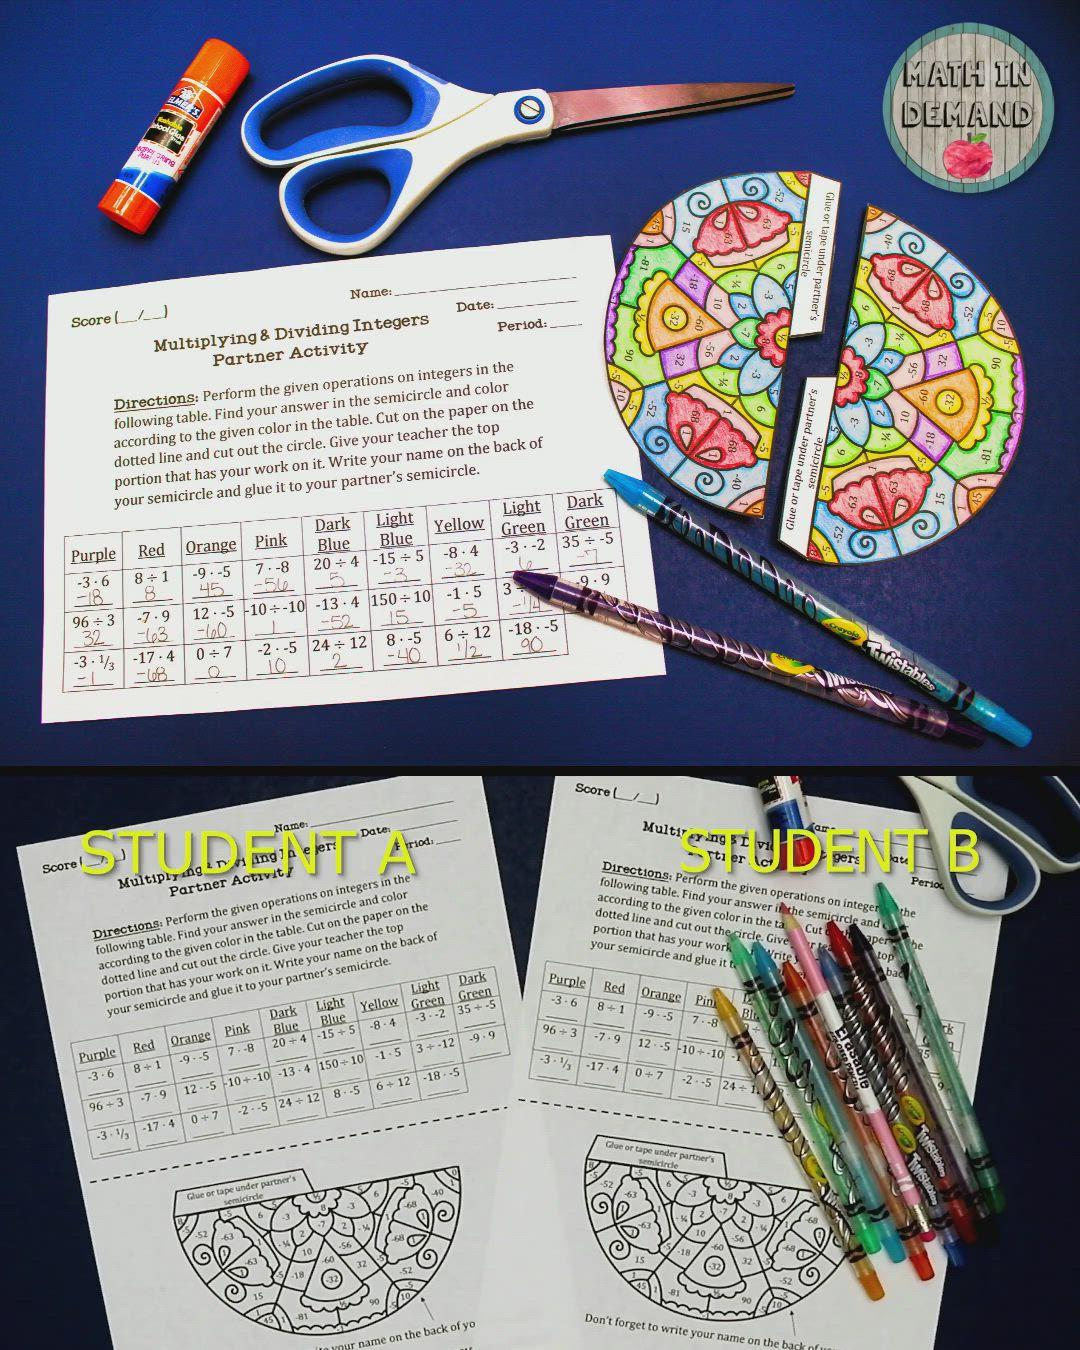 Multiplying And Dividing Integers Partner Coloring Activity Video Dividing Integers Multiplying And Dividing Integers Integers [ 1350 x 1080 Pixel ]